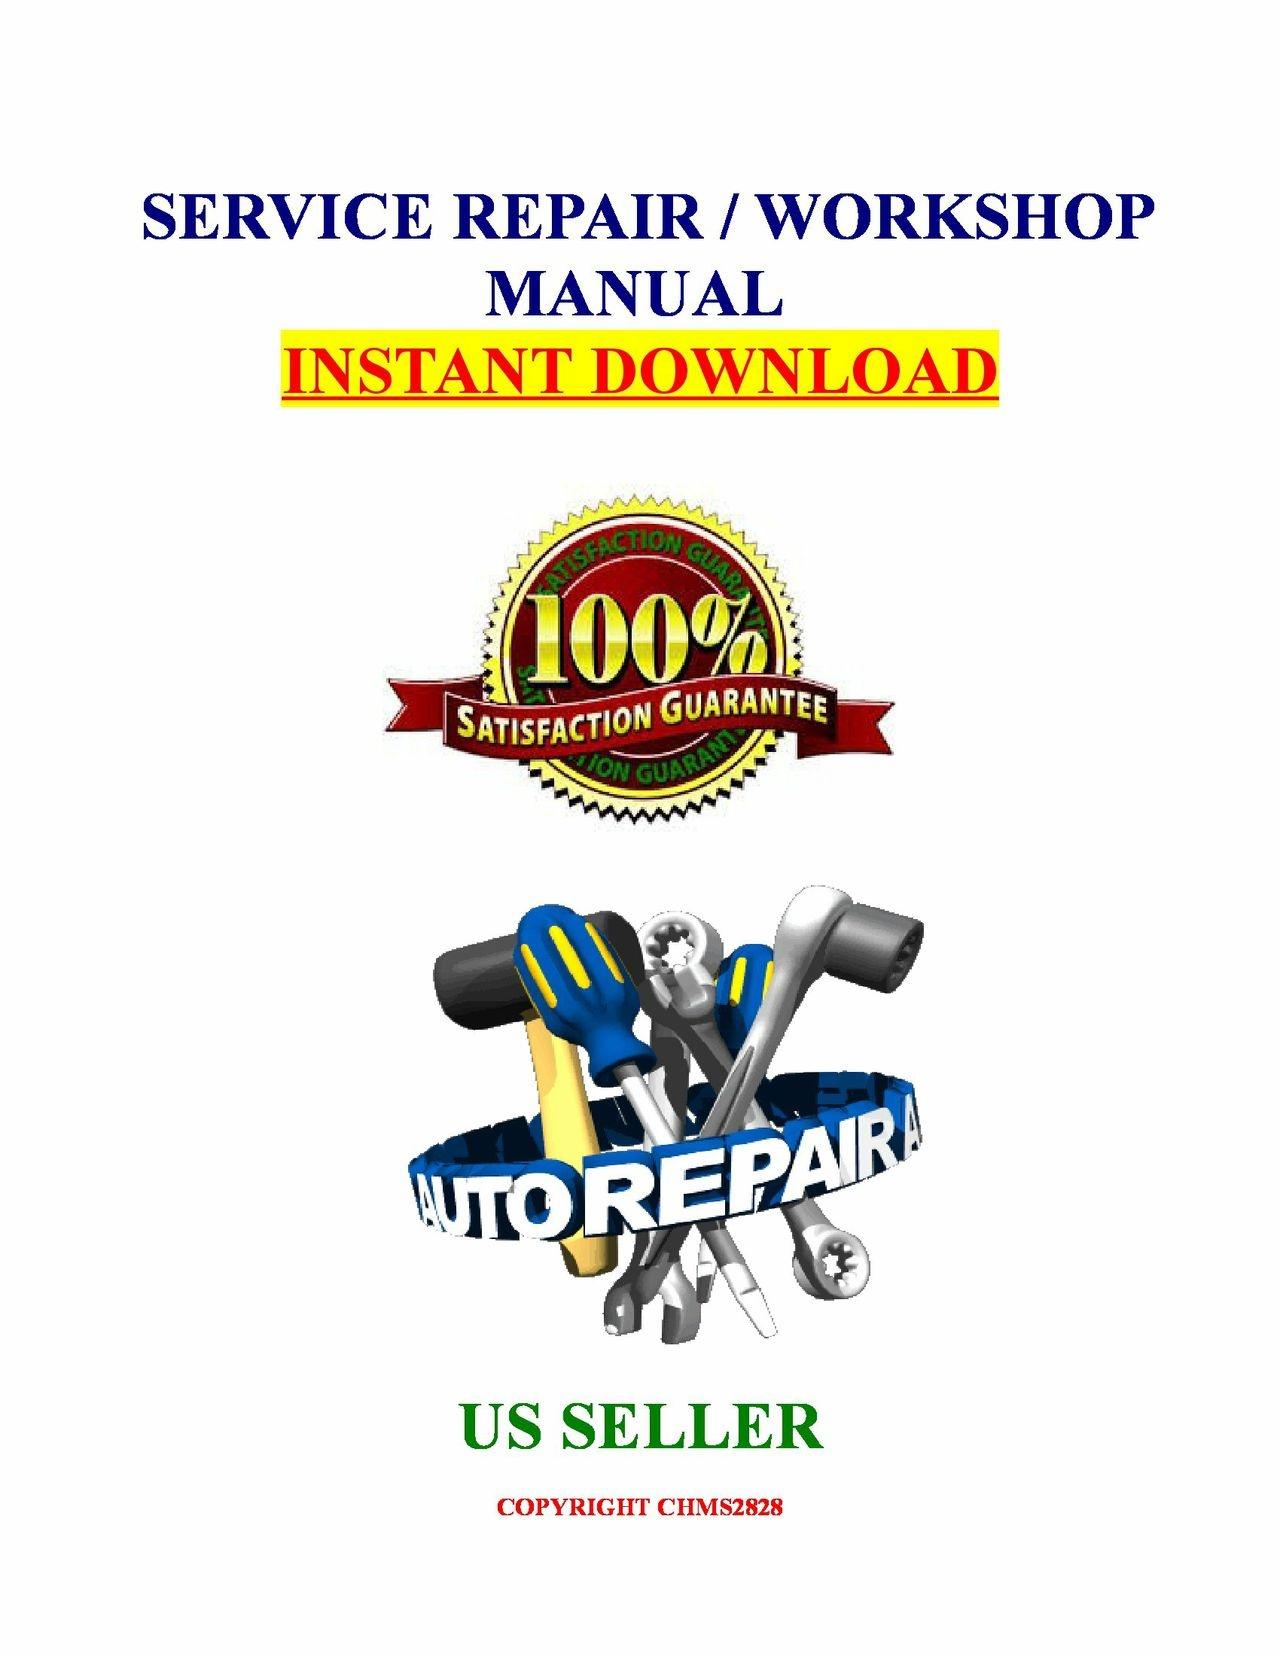 2005 rmz 250 repair manual suzuki rm250 service repair manual instant download rm 250 array jim u0027s manuals page 2 sellfy com rh sellfy com fandeluxe Images